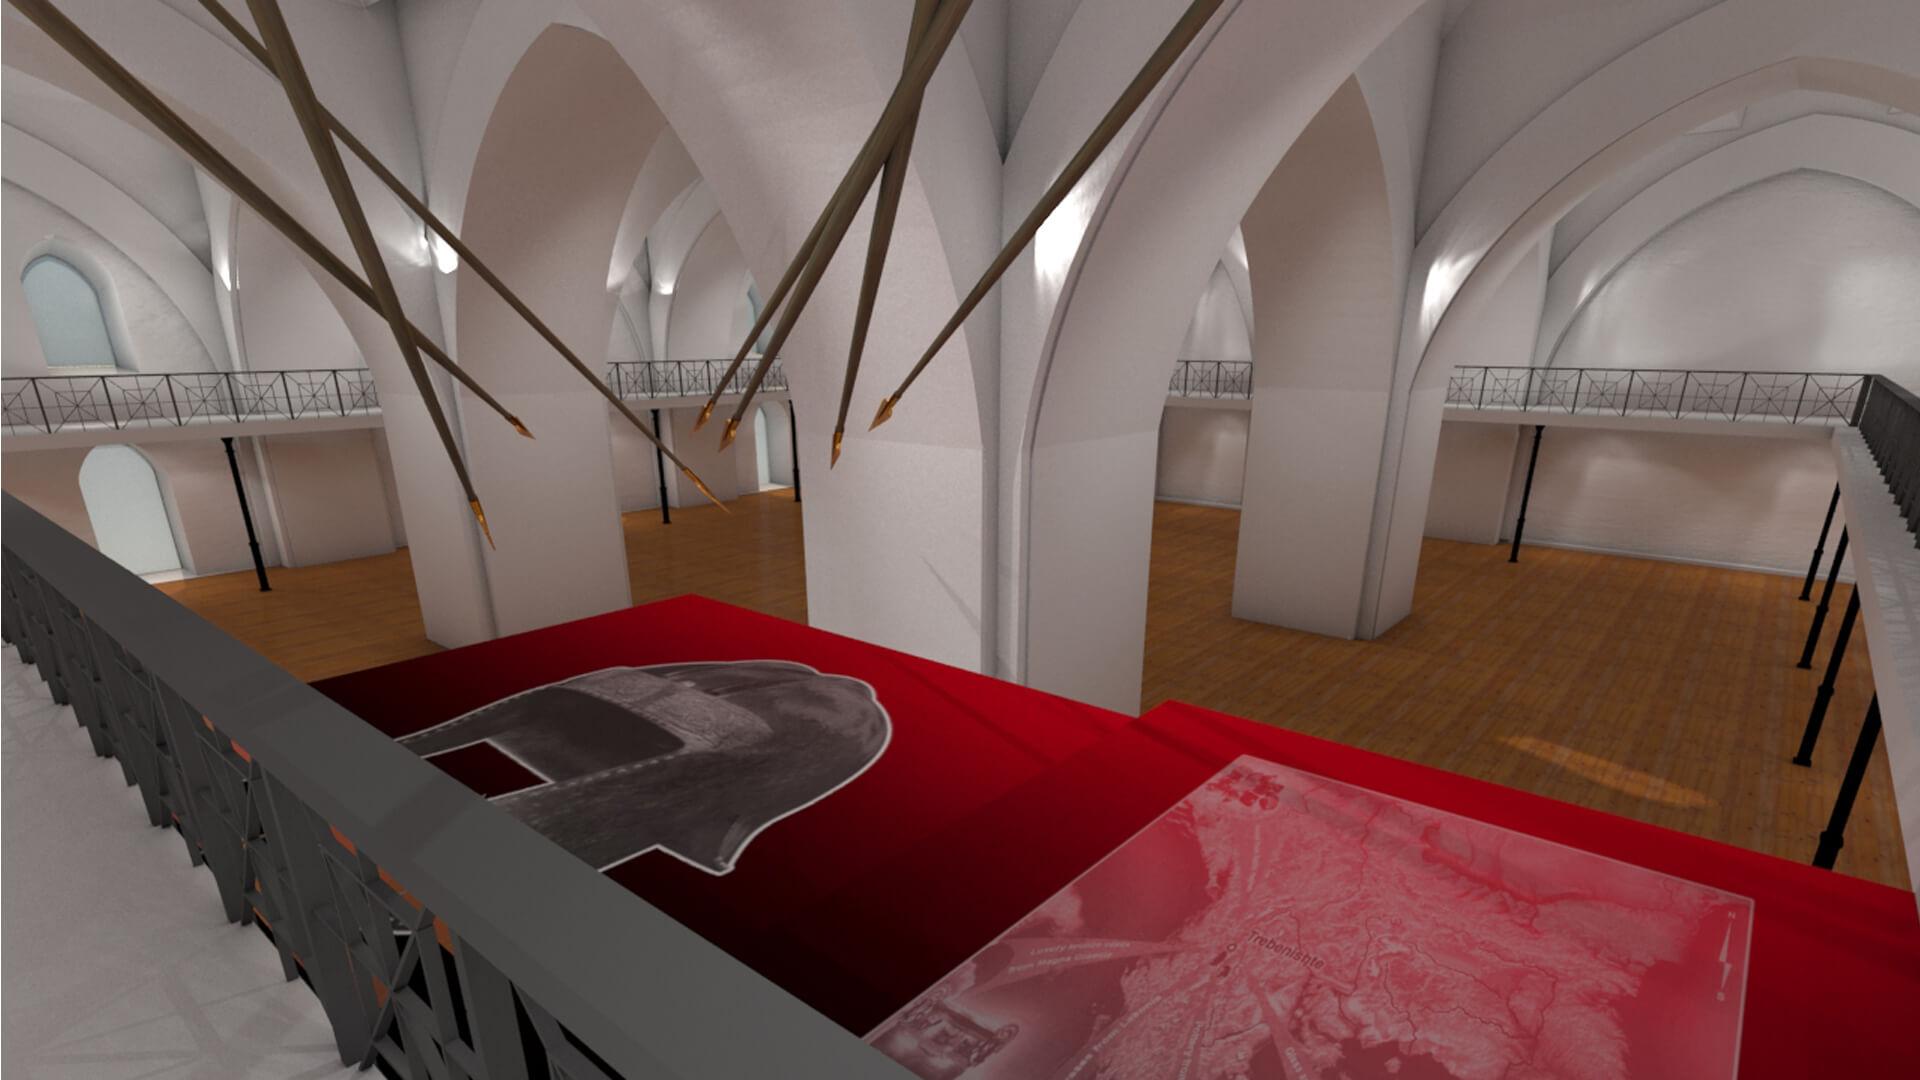 Exhibition-Archaeologisches-Nationalmuseum-NAIM-Sofia_02